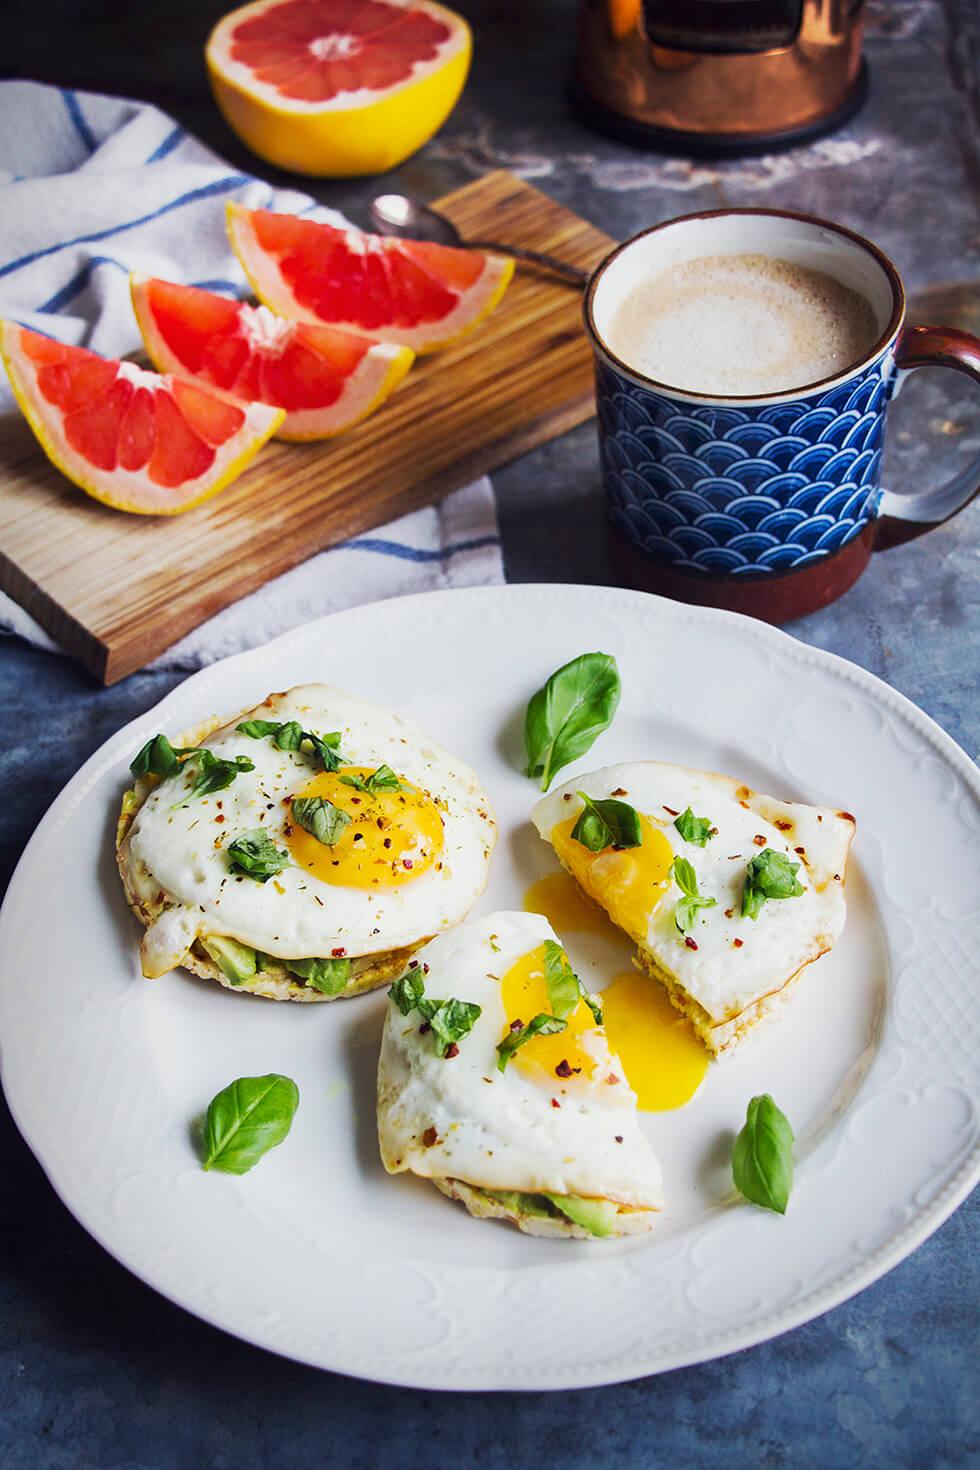 frukost_majskakor_agg_avokado_basilika_oatly_ikaffe_1